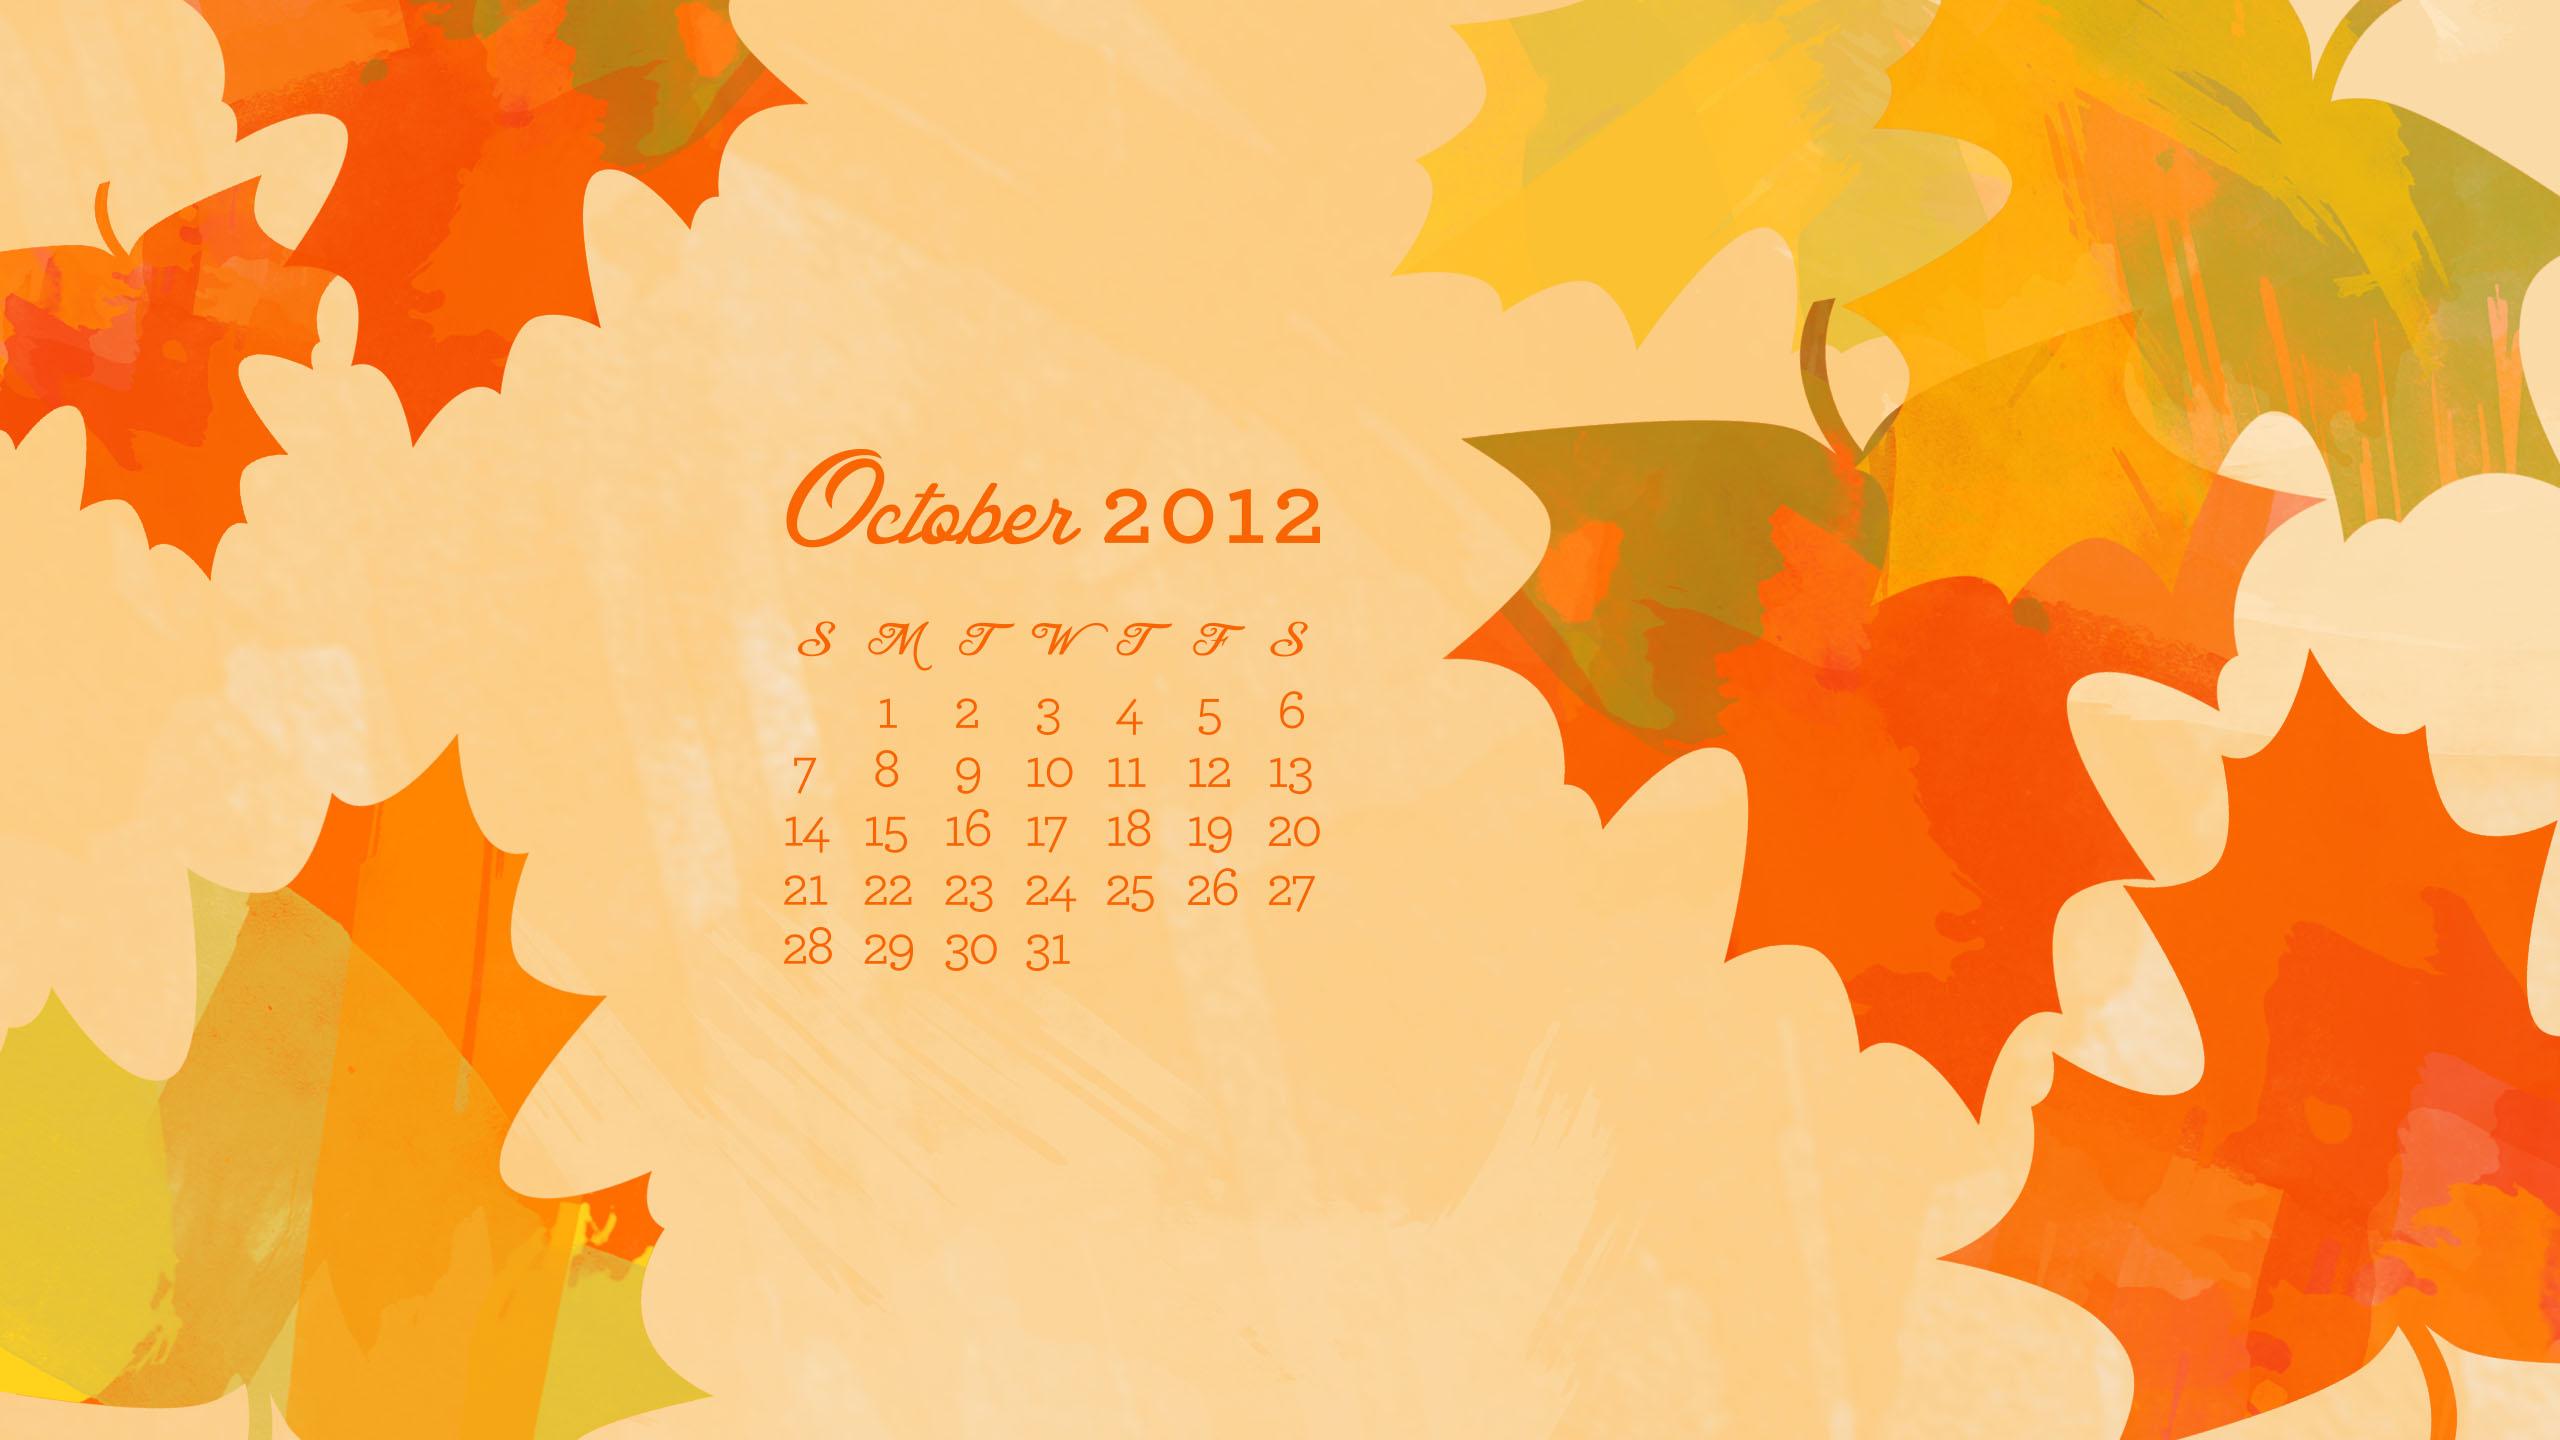 October Calendar Wallpaper Iphone : October desktop iphone ipad calendar wallpaper